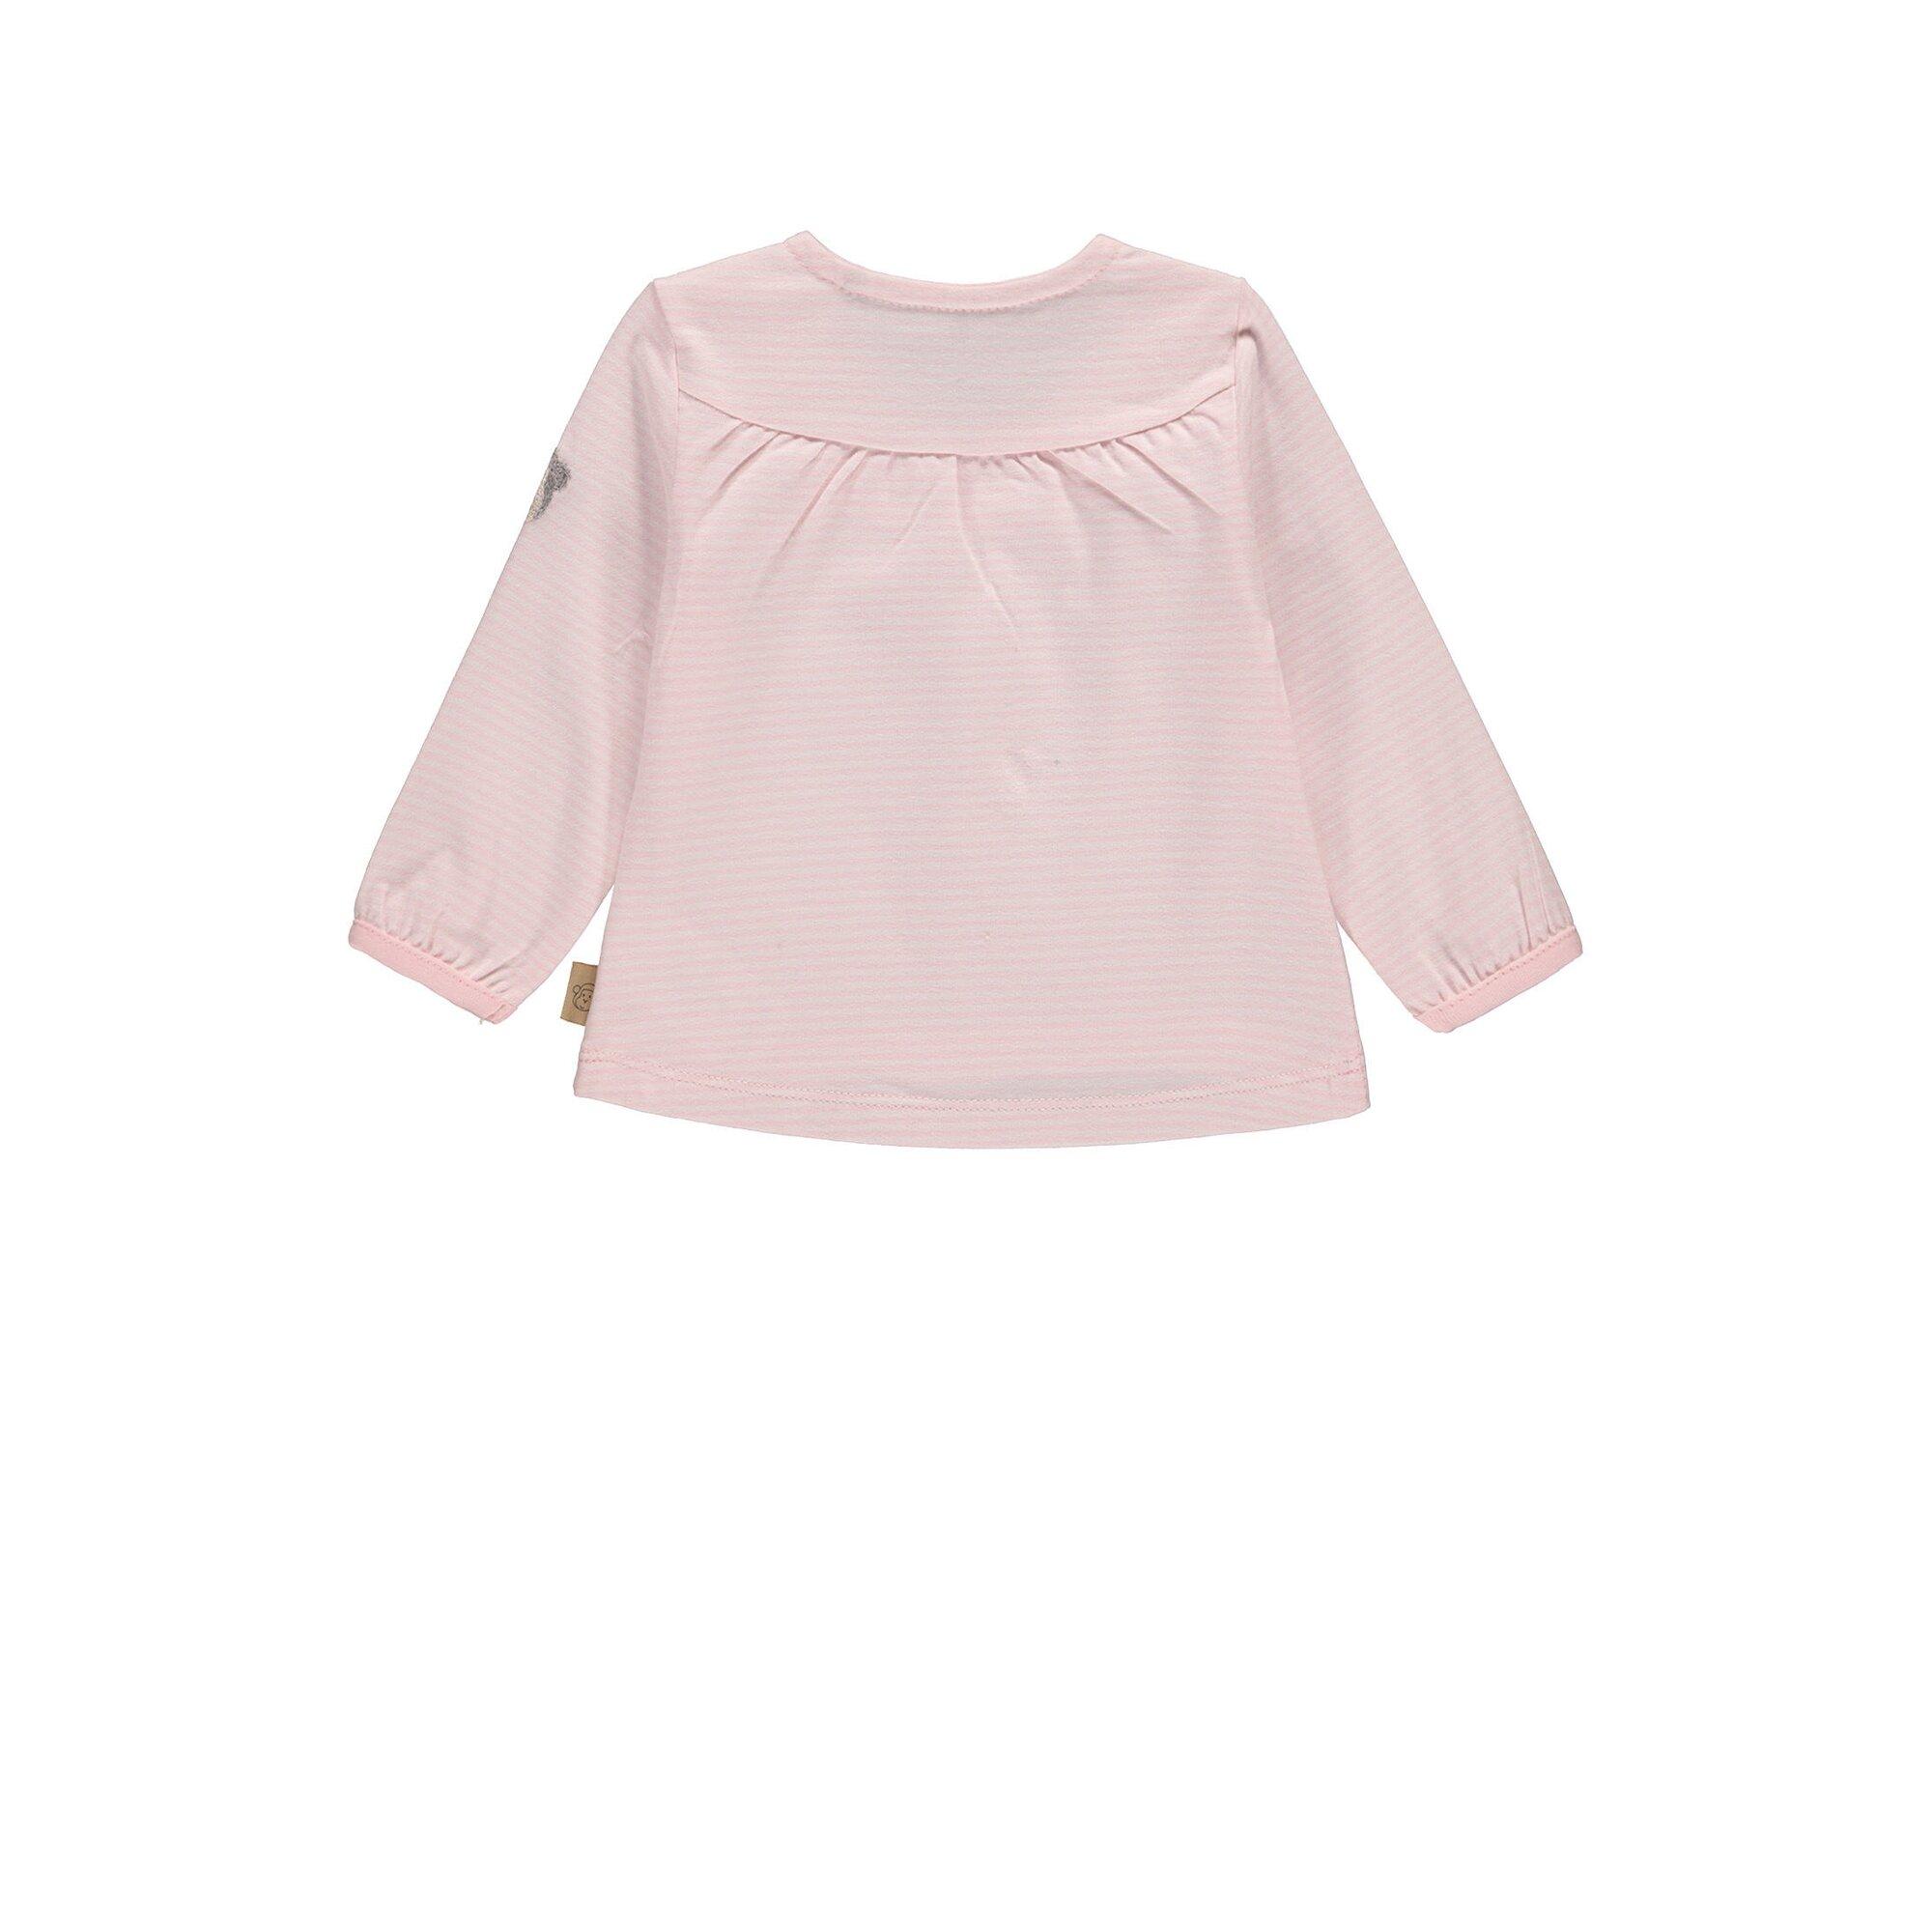 bellybutton-langarmshirt, 24.95 EUR @ babywalz-de